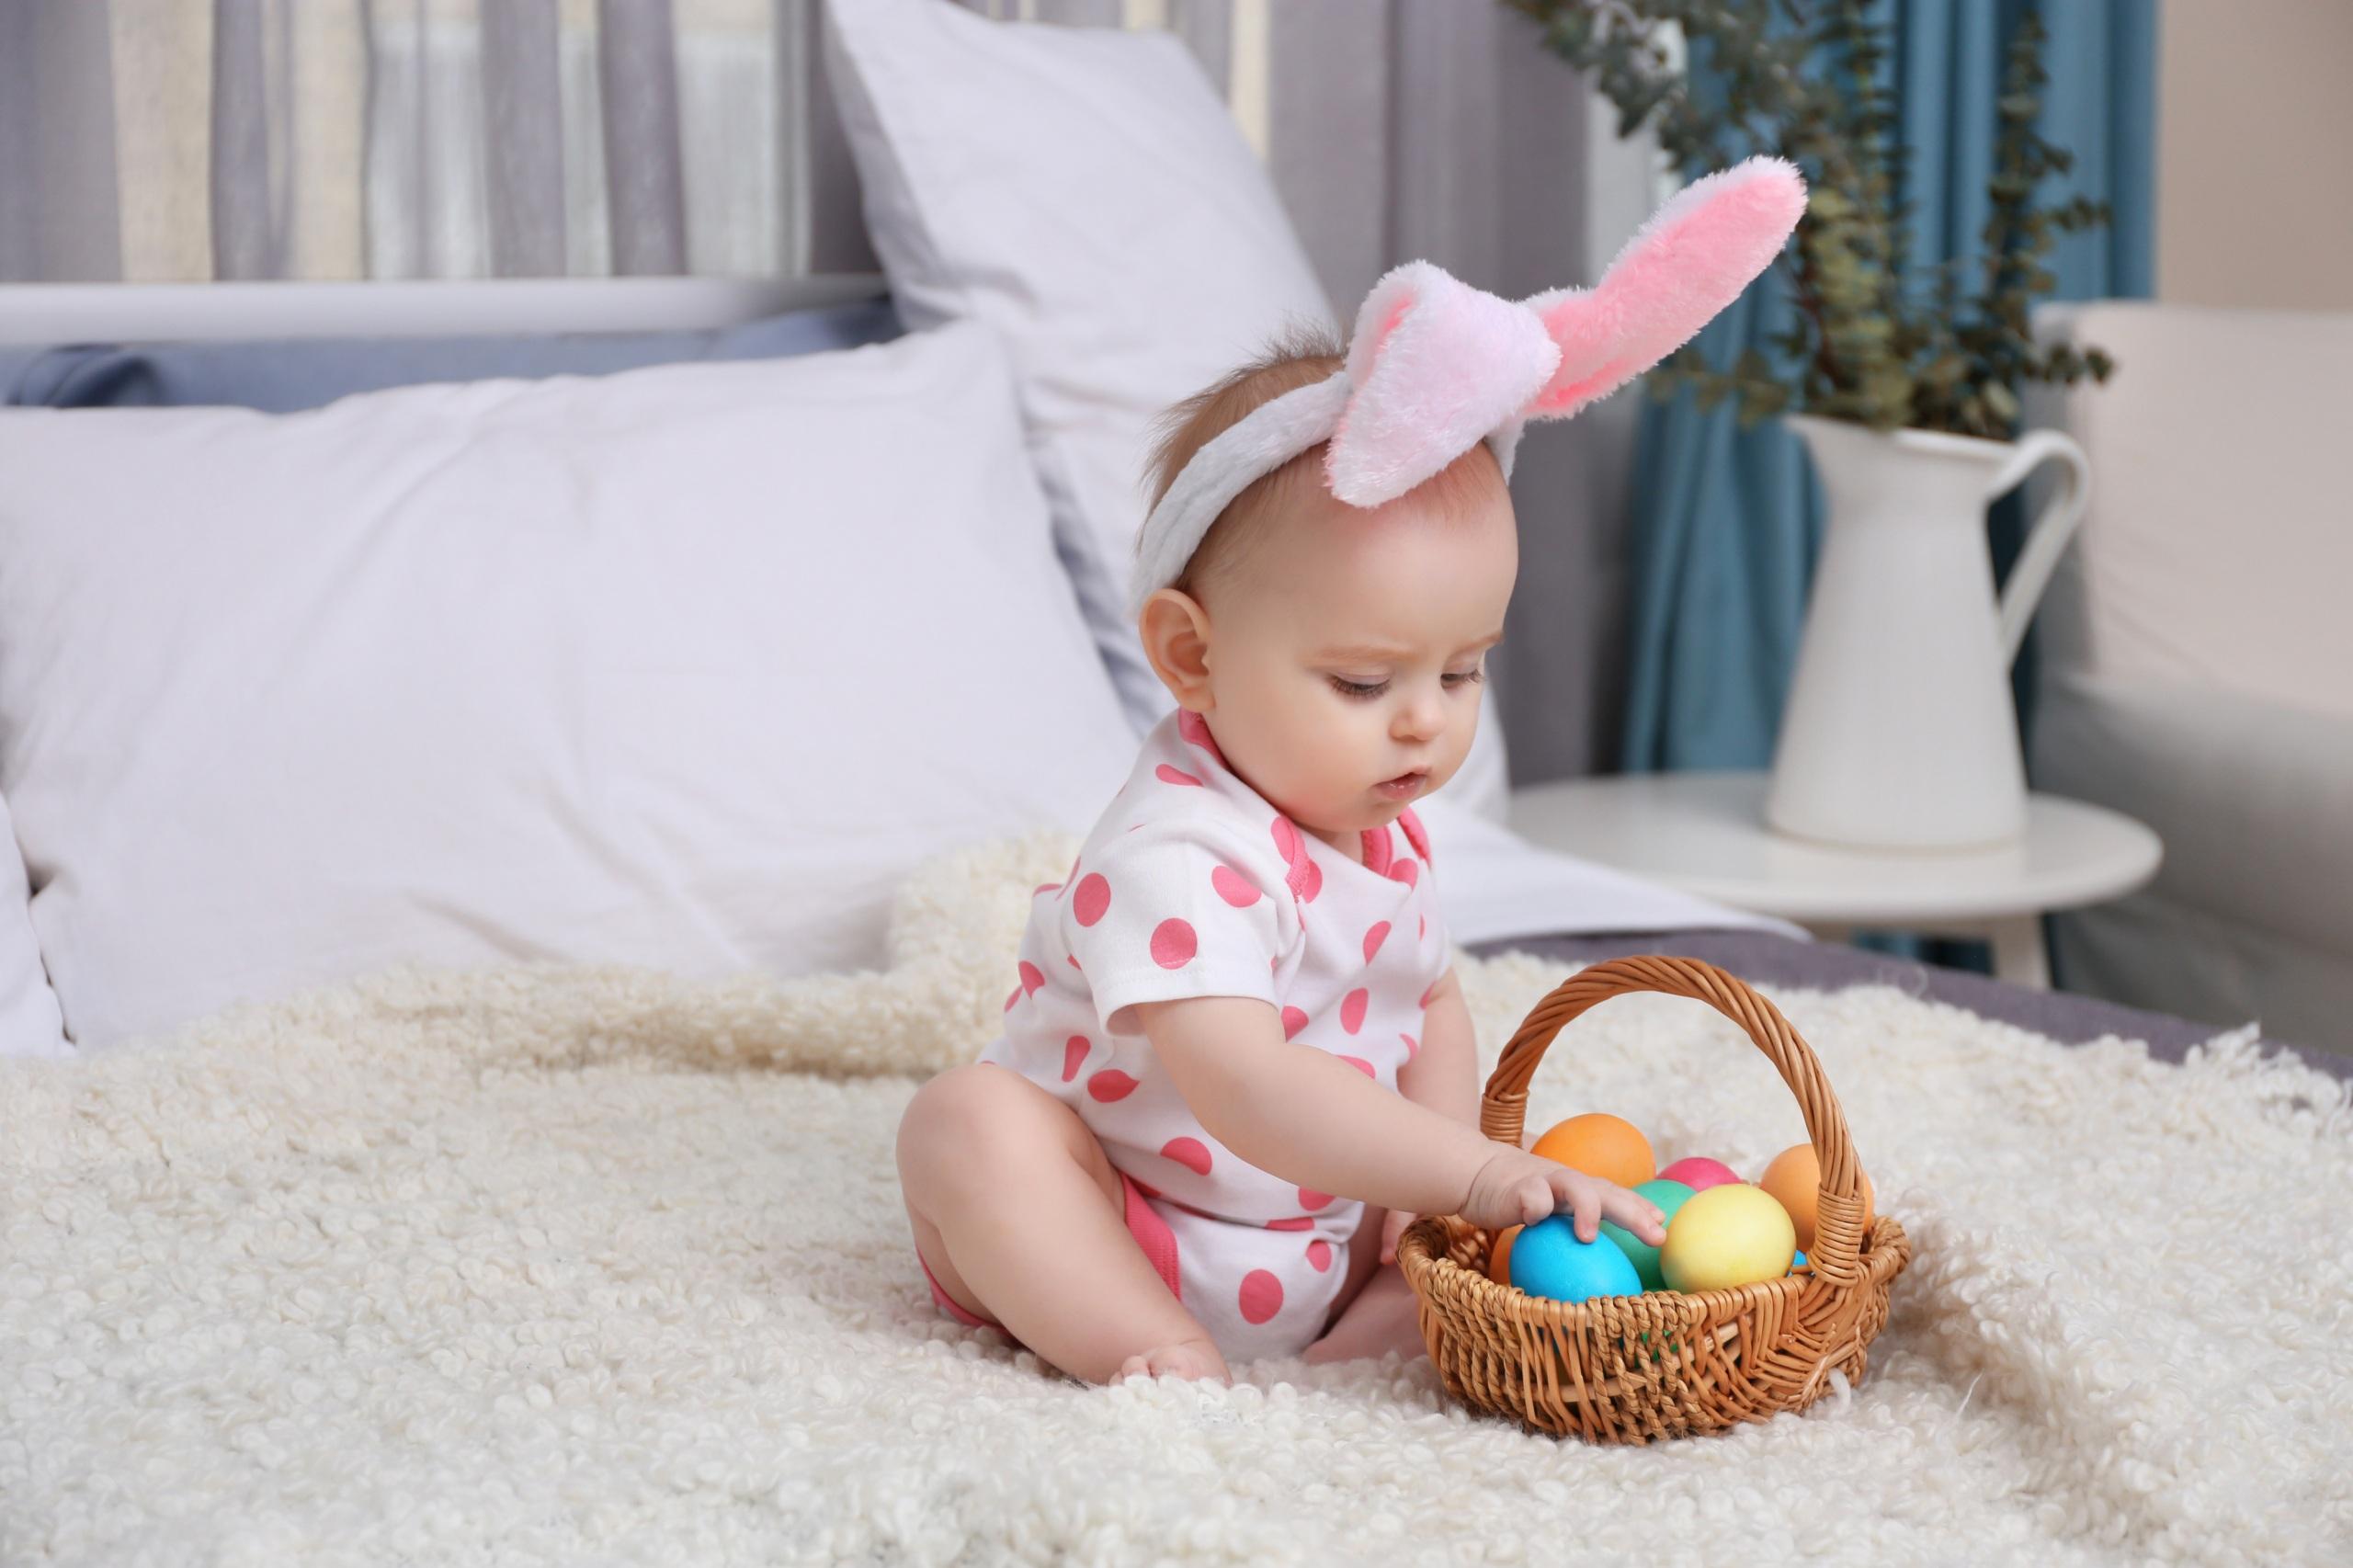 Фото Пасха младенец яйцами ребёнок Корзина 2560x1706 младенца Младенцы грудной ребёнок яиц Дети Яйца яйцо корзины Корзинка